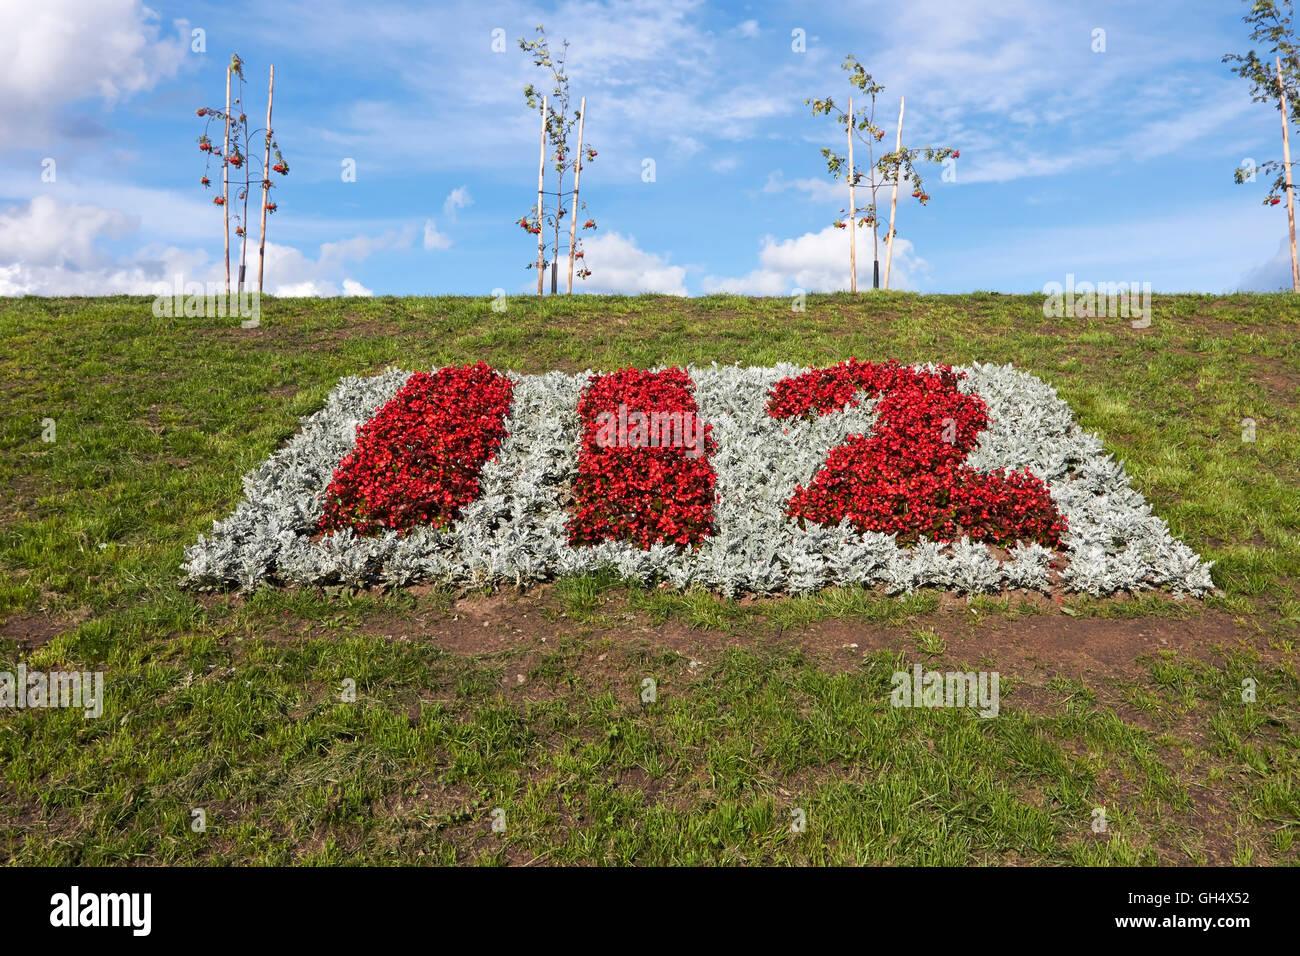 112 emergency number in flowers - Stock Image